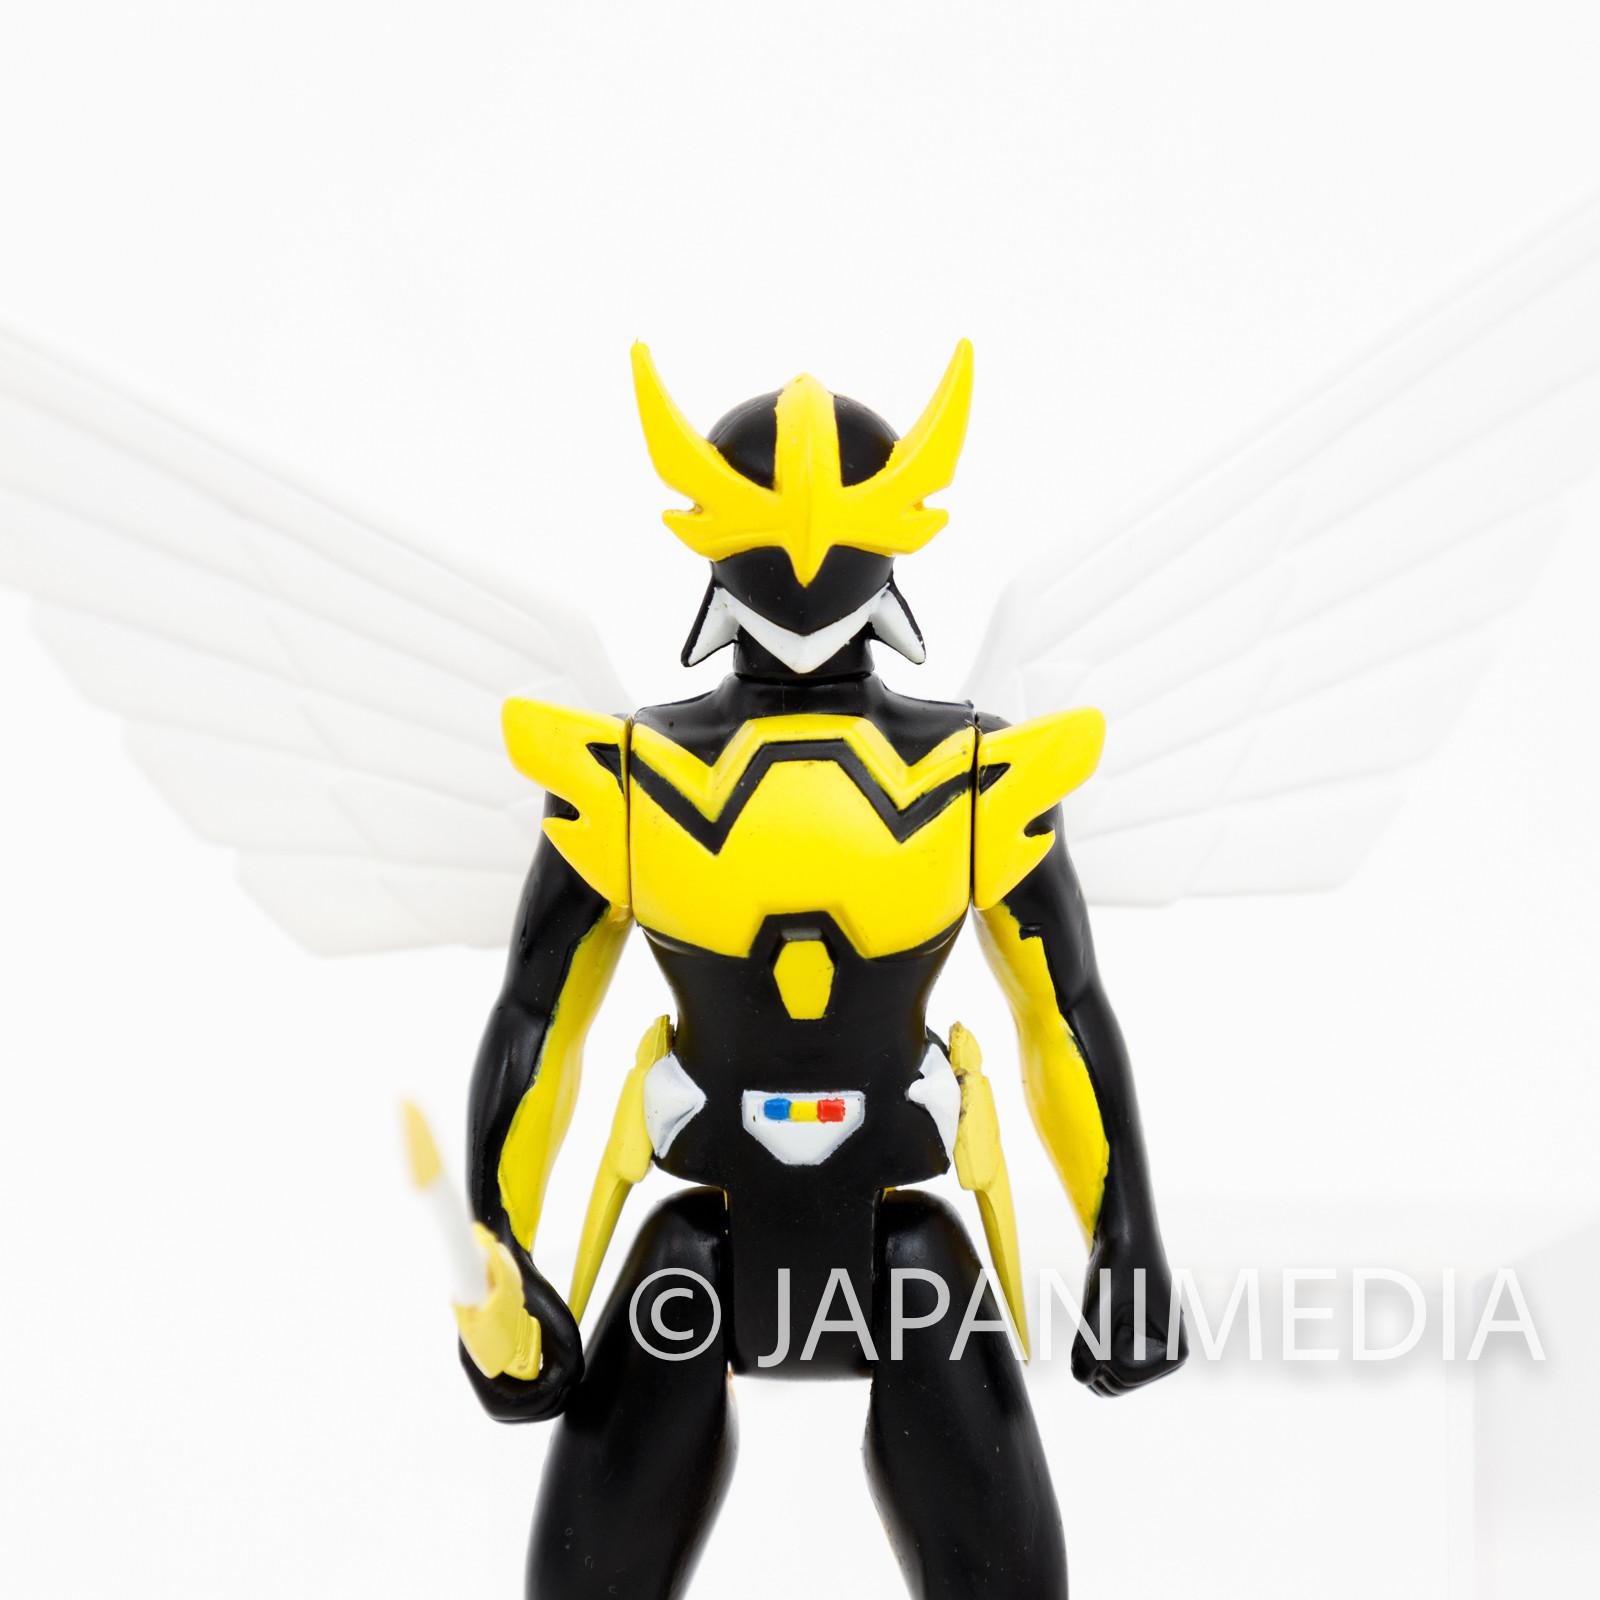 WINGMAN Yellow Action Figure Collection Banpresto JAPAN ANIME MANGA